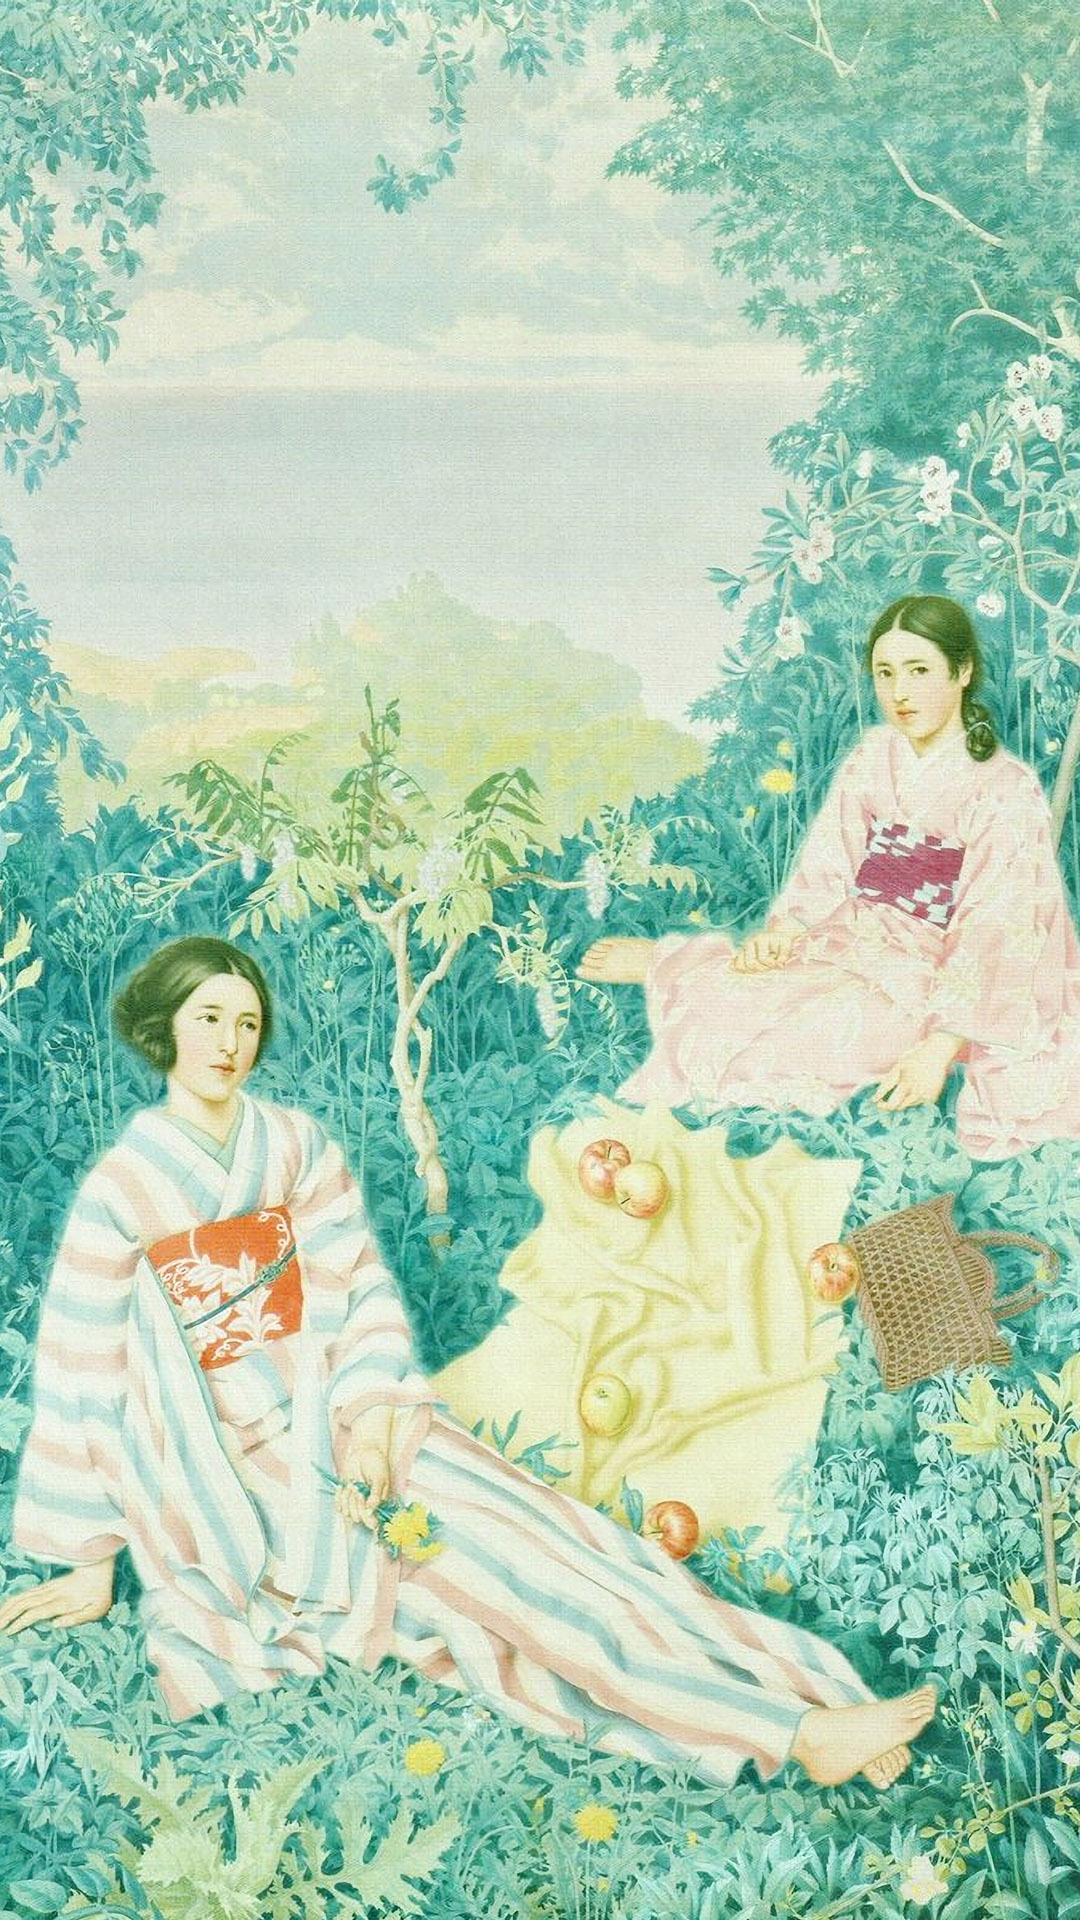 Mizutani Michihiko - Spring 1080x1920